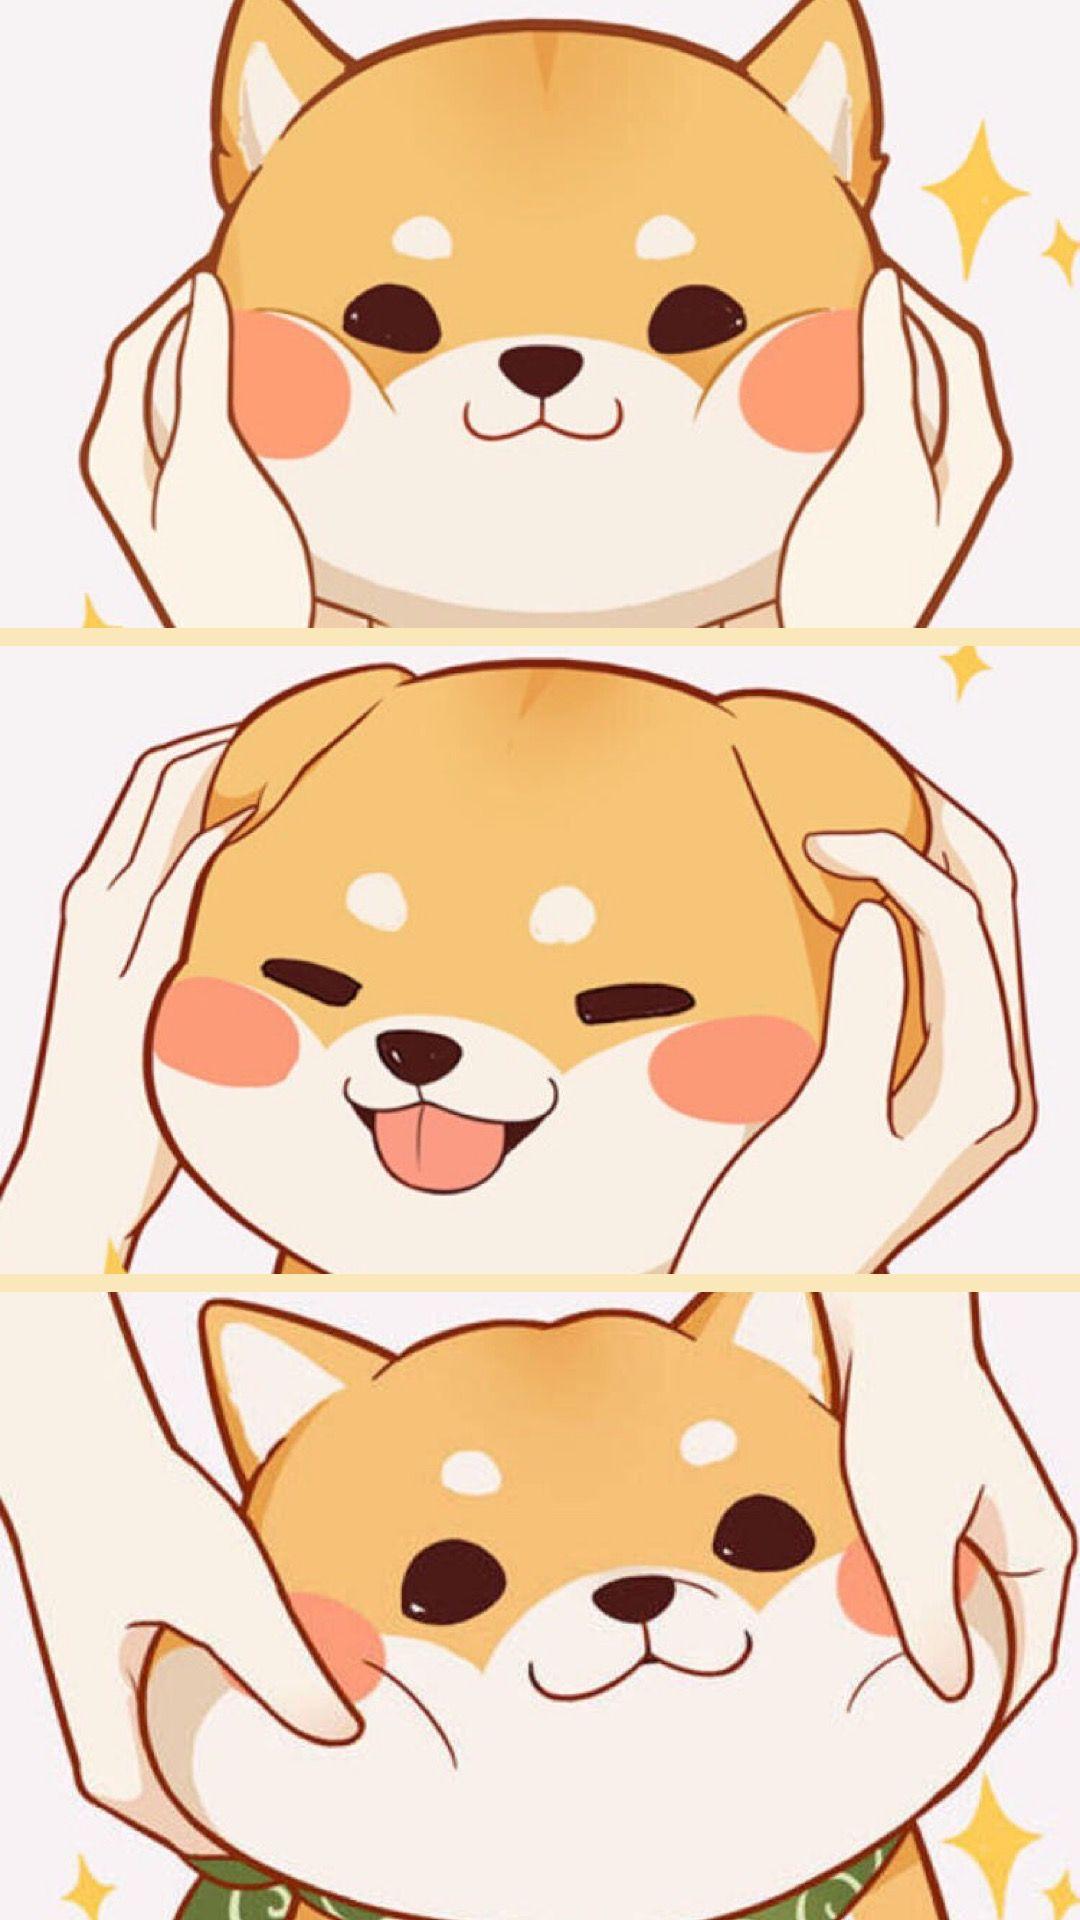 Corgi Wallpaper Corgi Wallpaper Corgi Wallpaper Iphone Cute Dog Cartoon